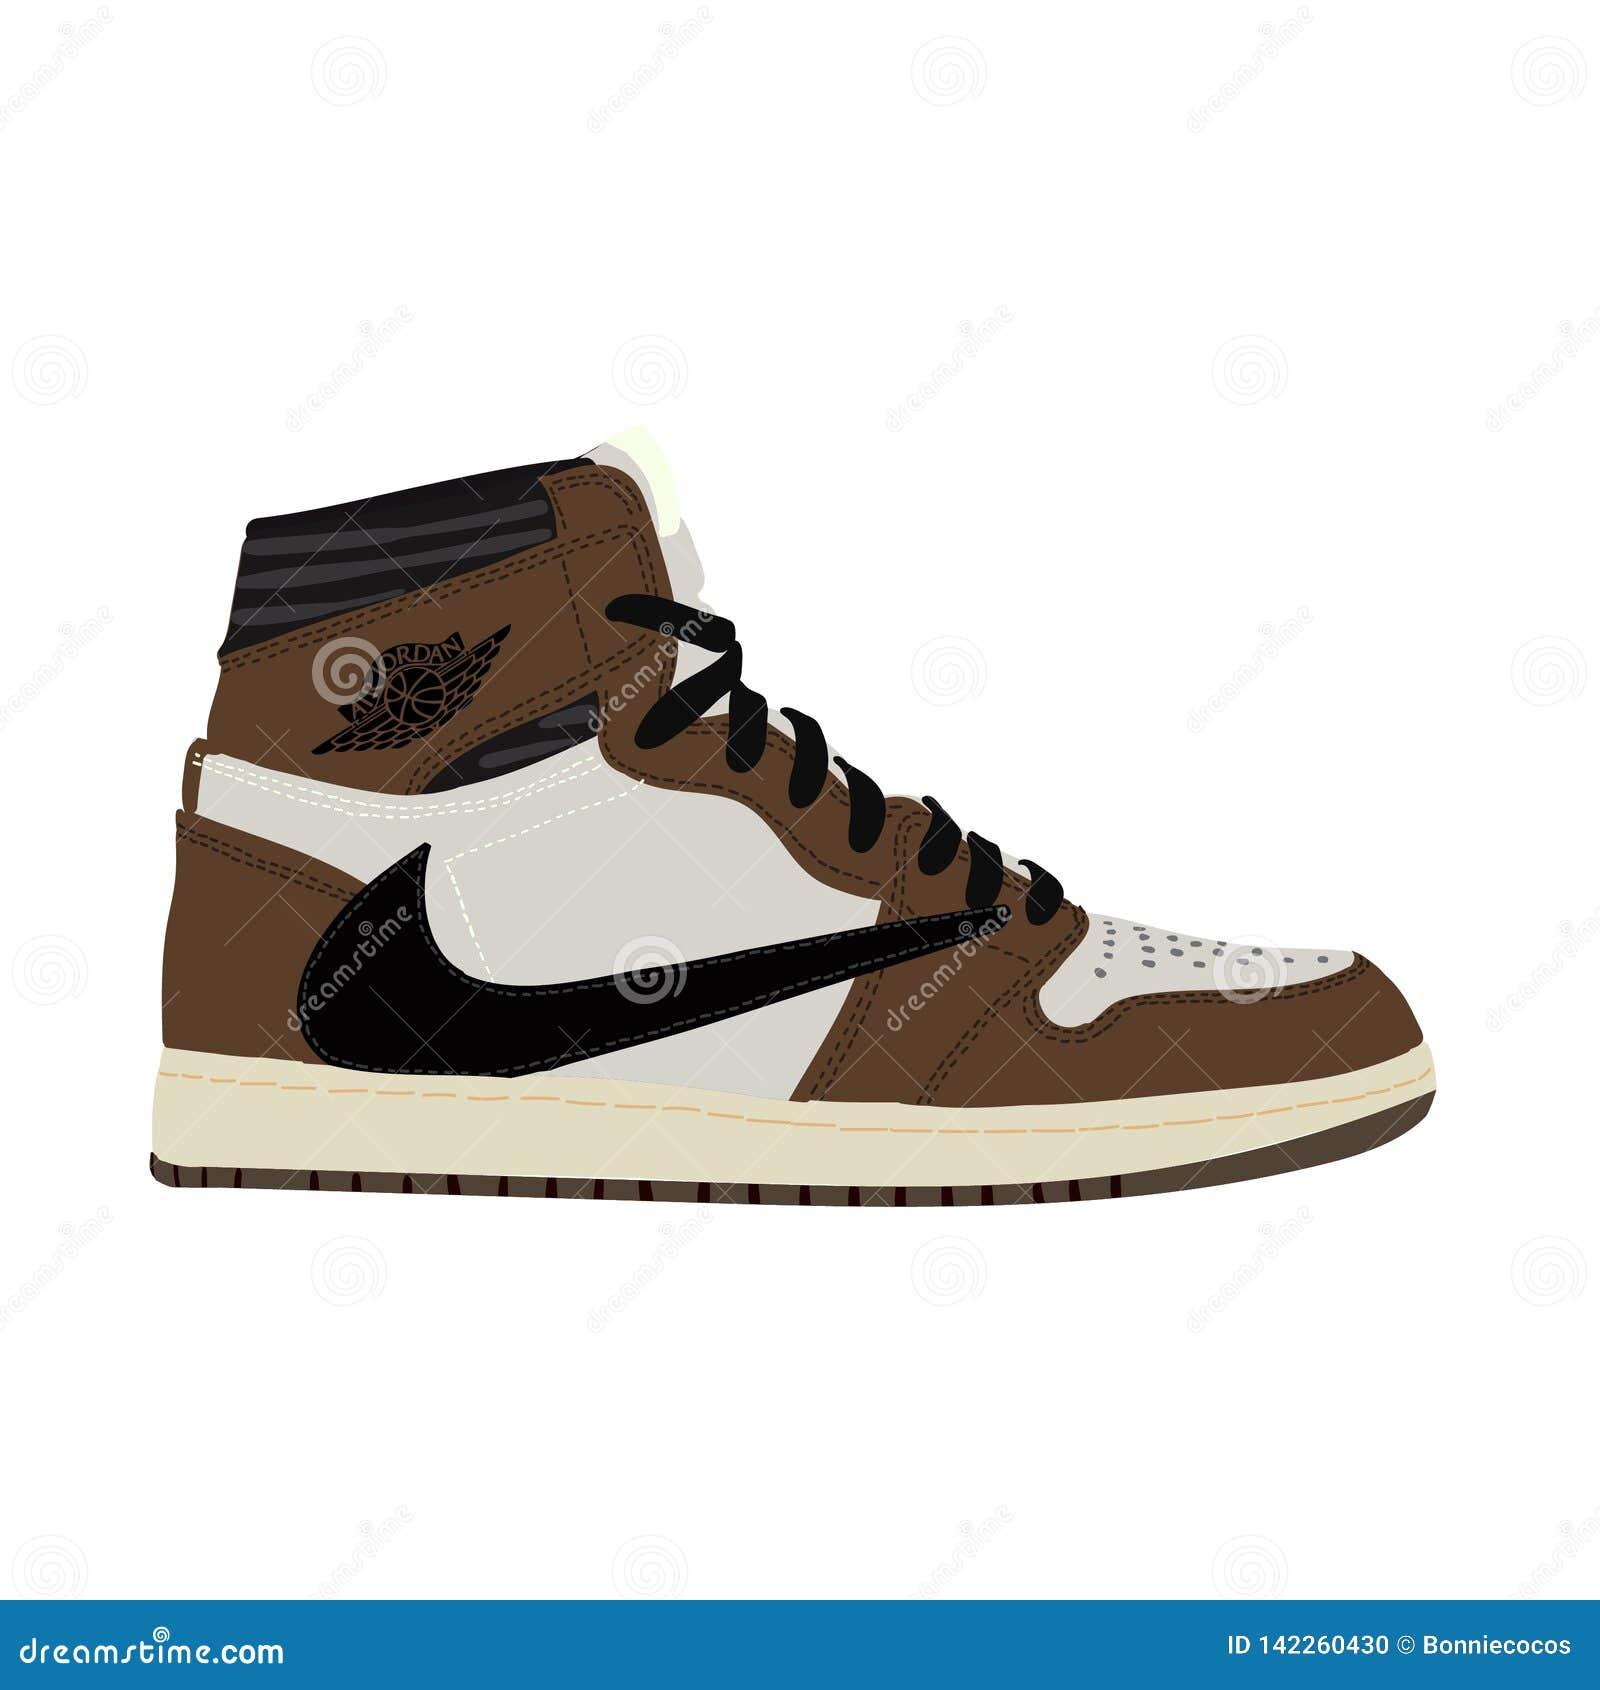 cheaper 82356 2ed6a Nike Air Jordan. Sneaker. Trainer. Flat design. Vector illustration. Jordan  1 Retro High Travis Scott